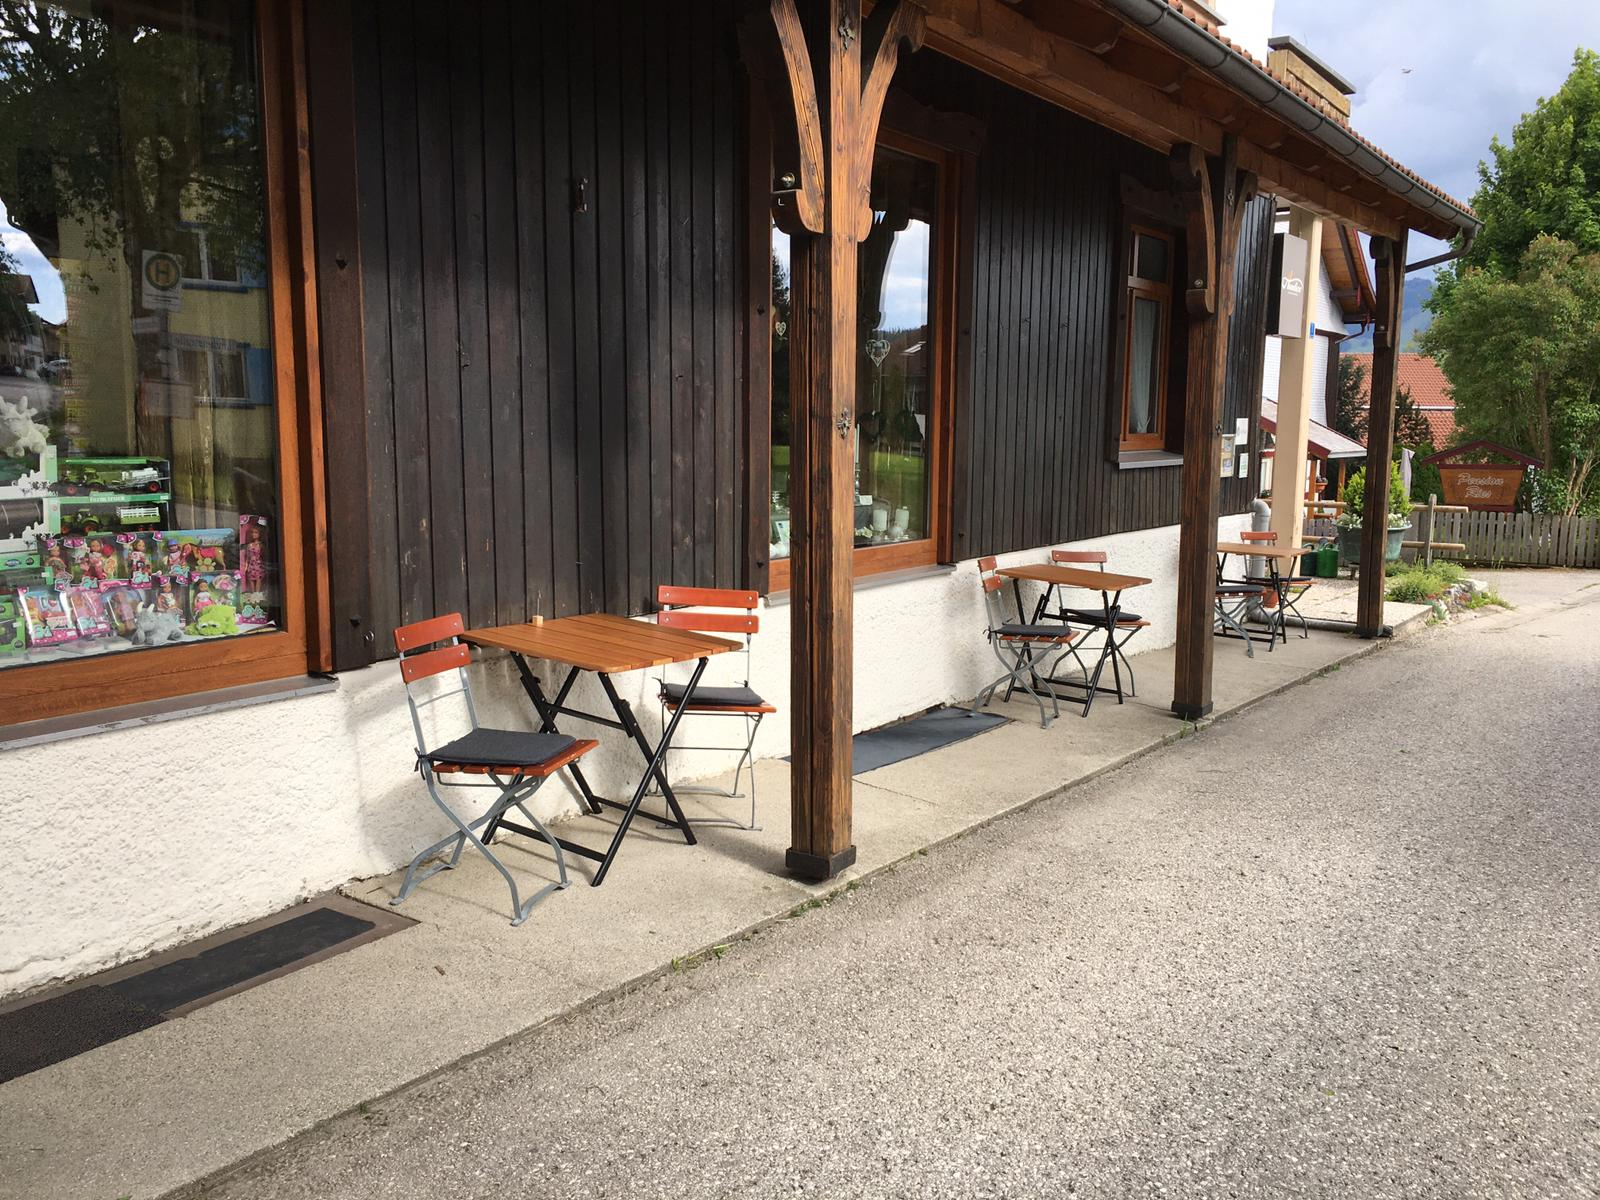 PARTE EXTERNA DEL CAFÉ ZUCKER ZWERG (Fotos Manuela Fischer)